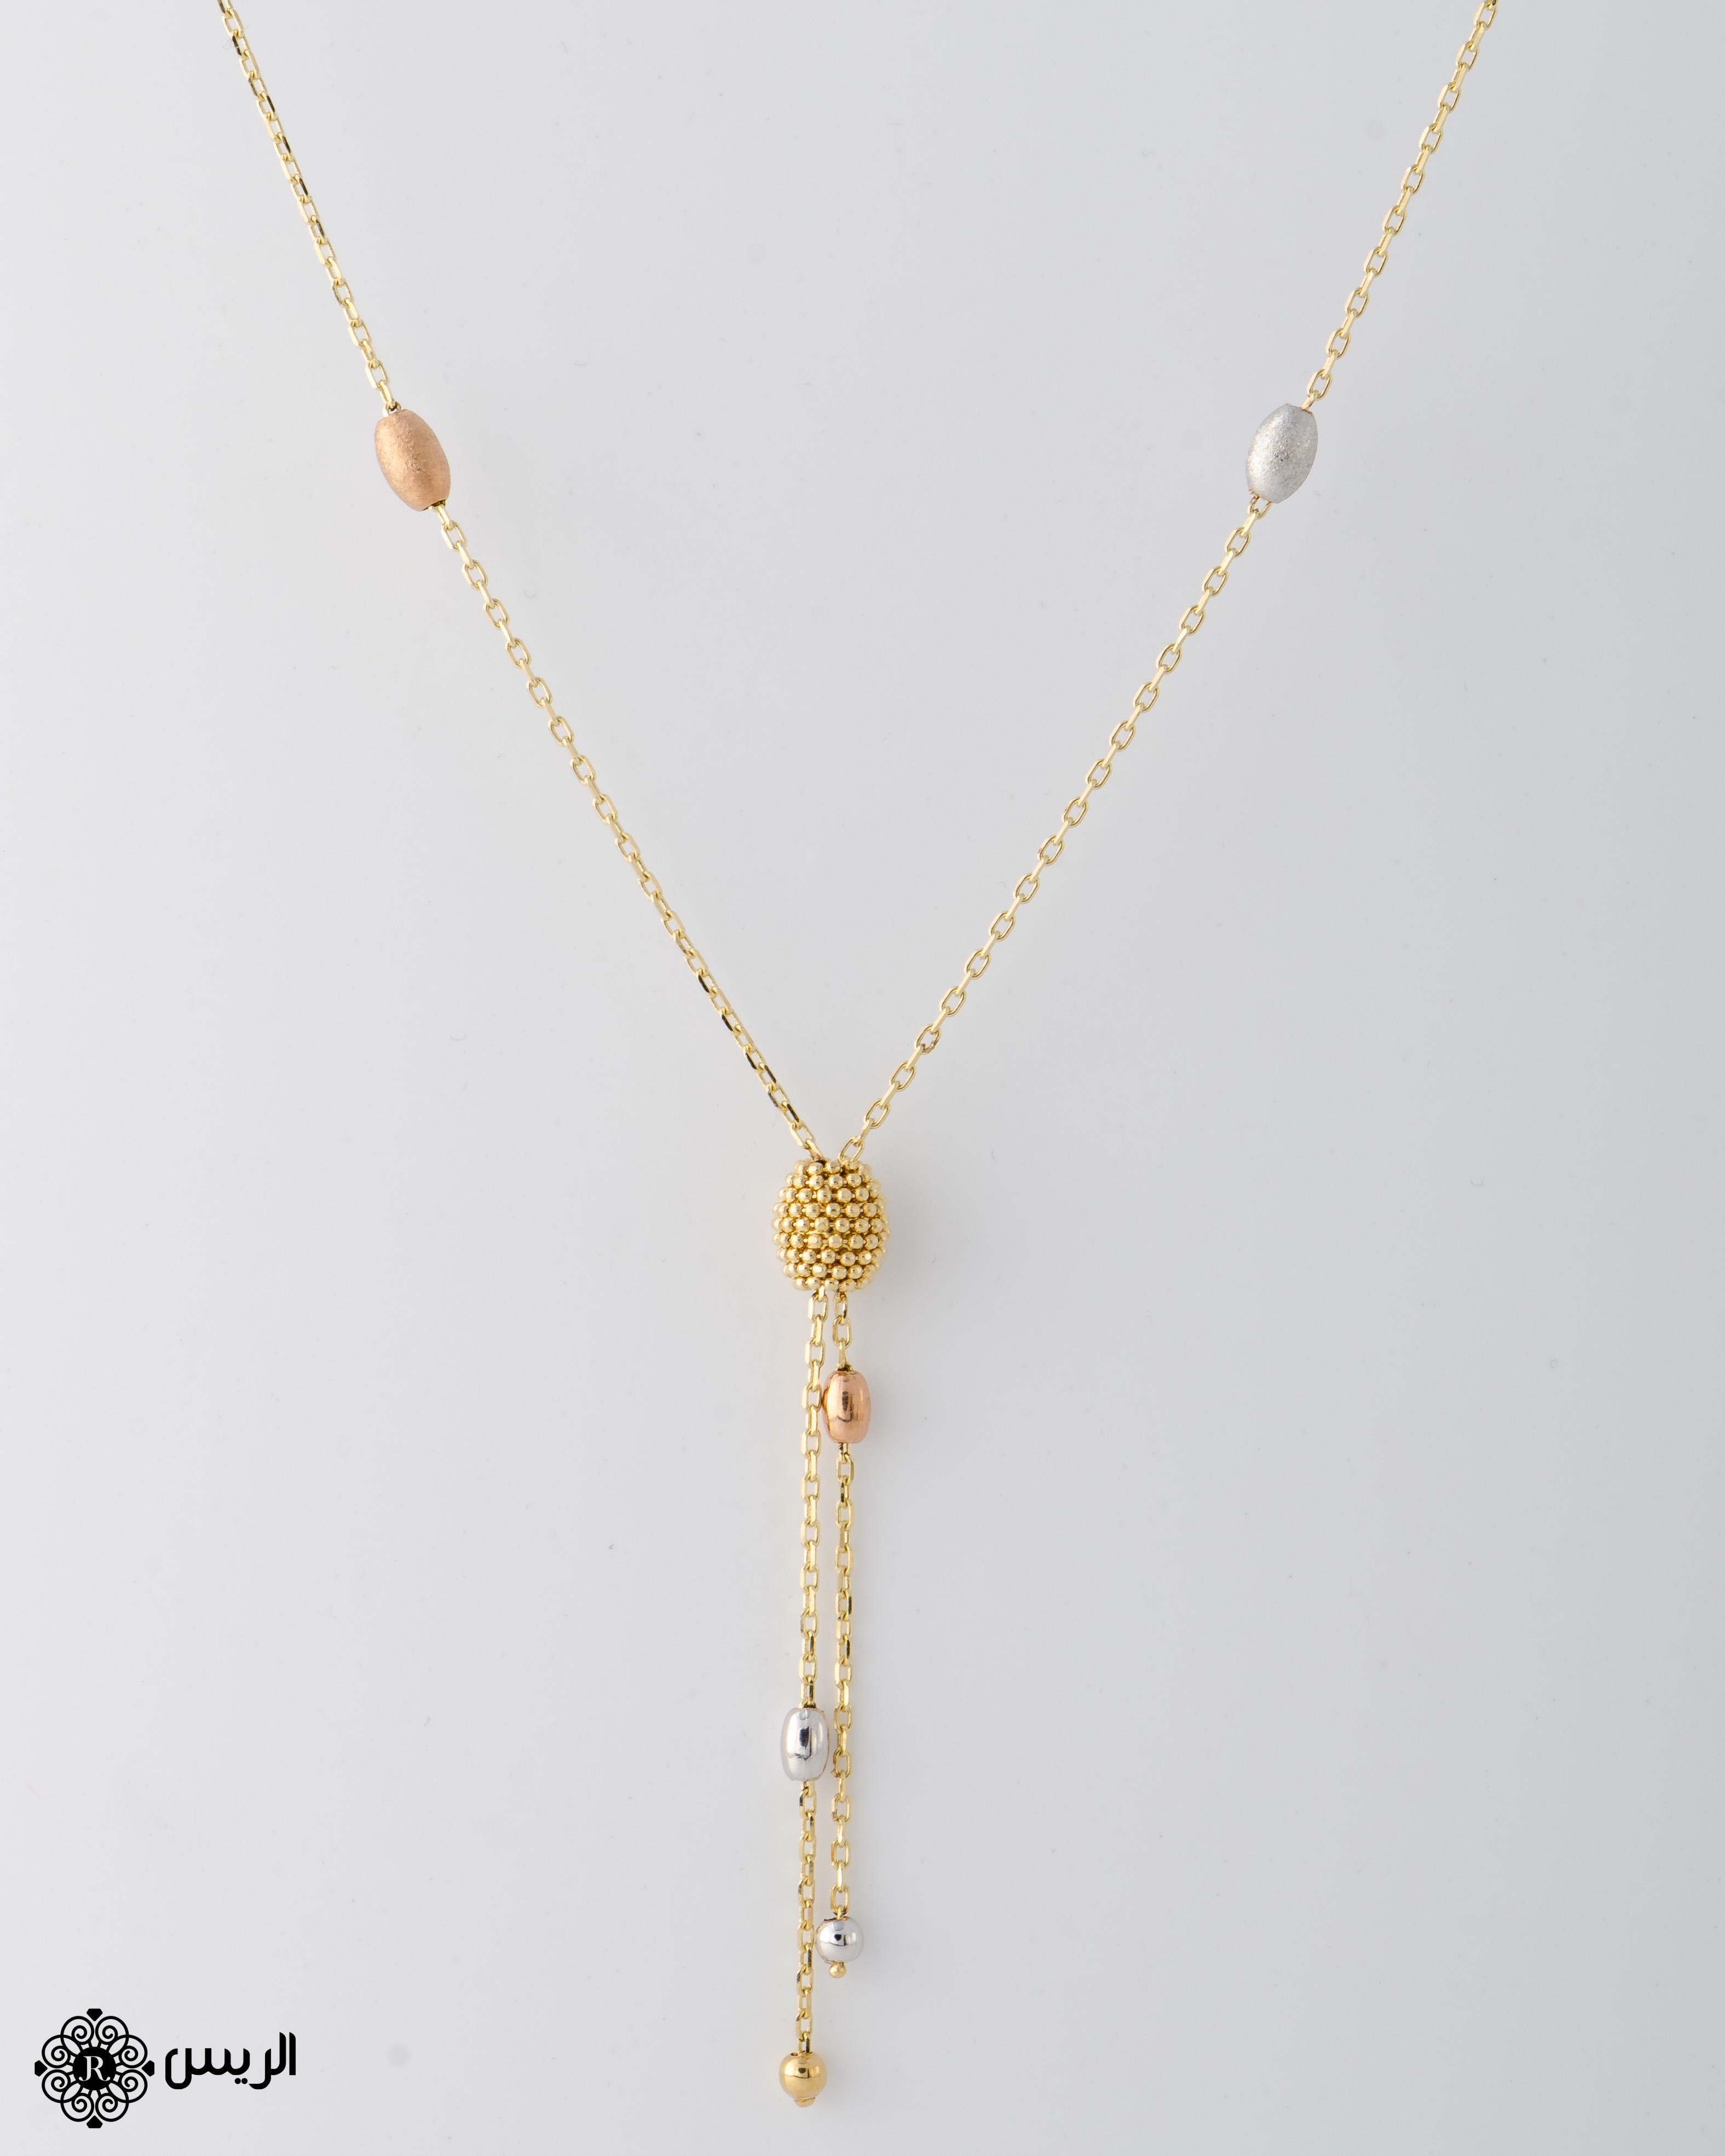 Raies jewelry Necklace عقد الريس للمجوهرات